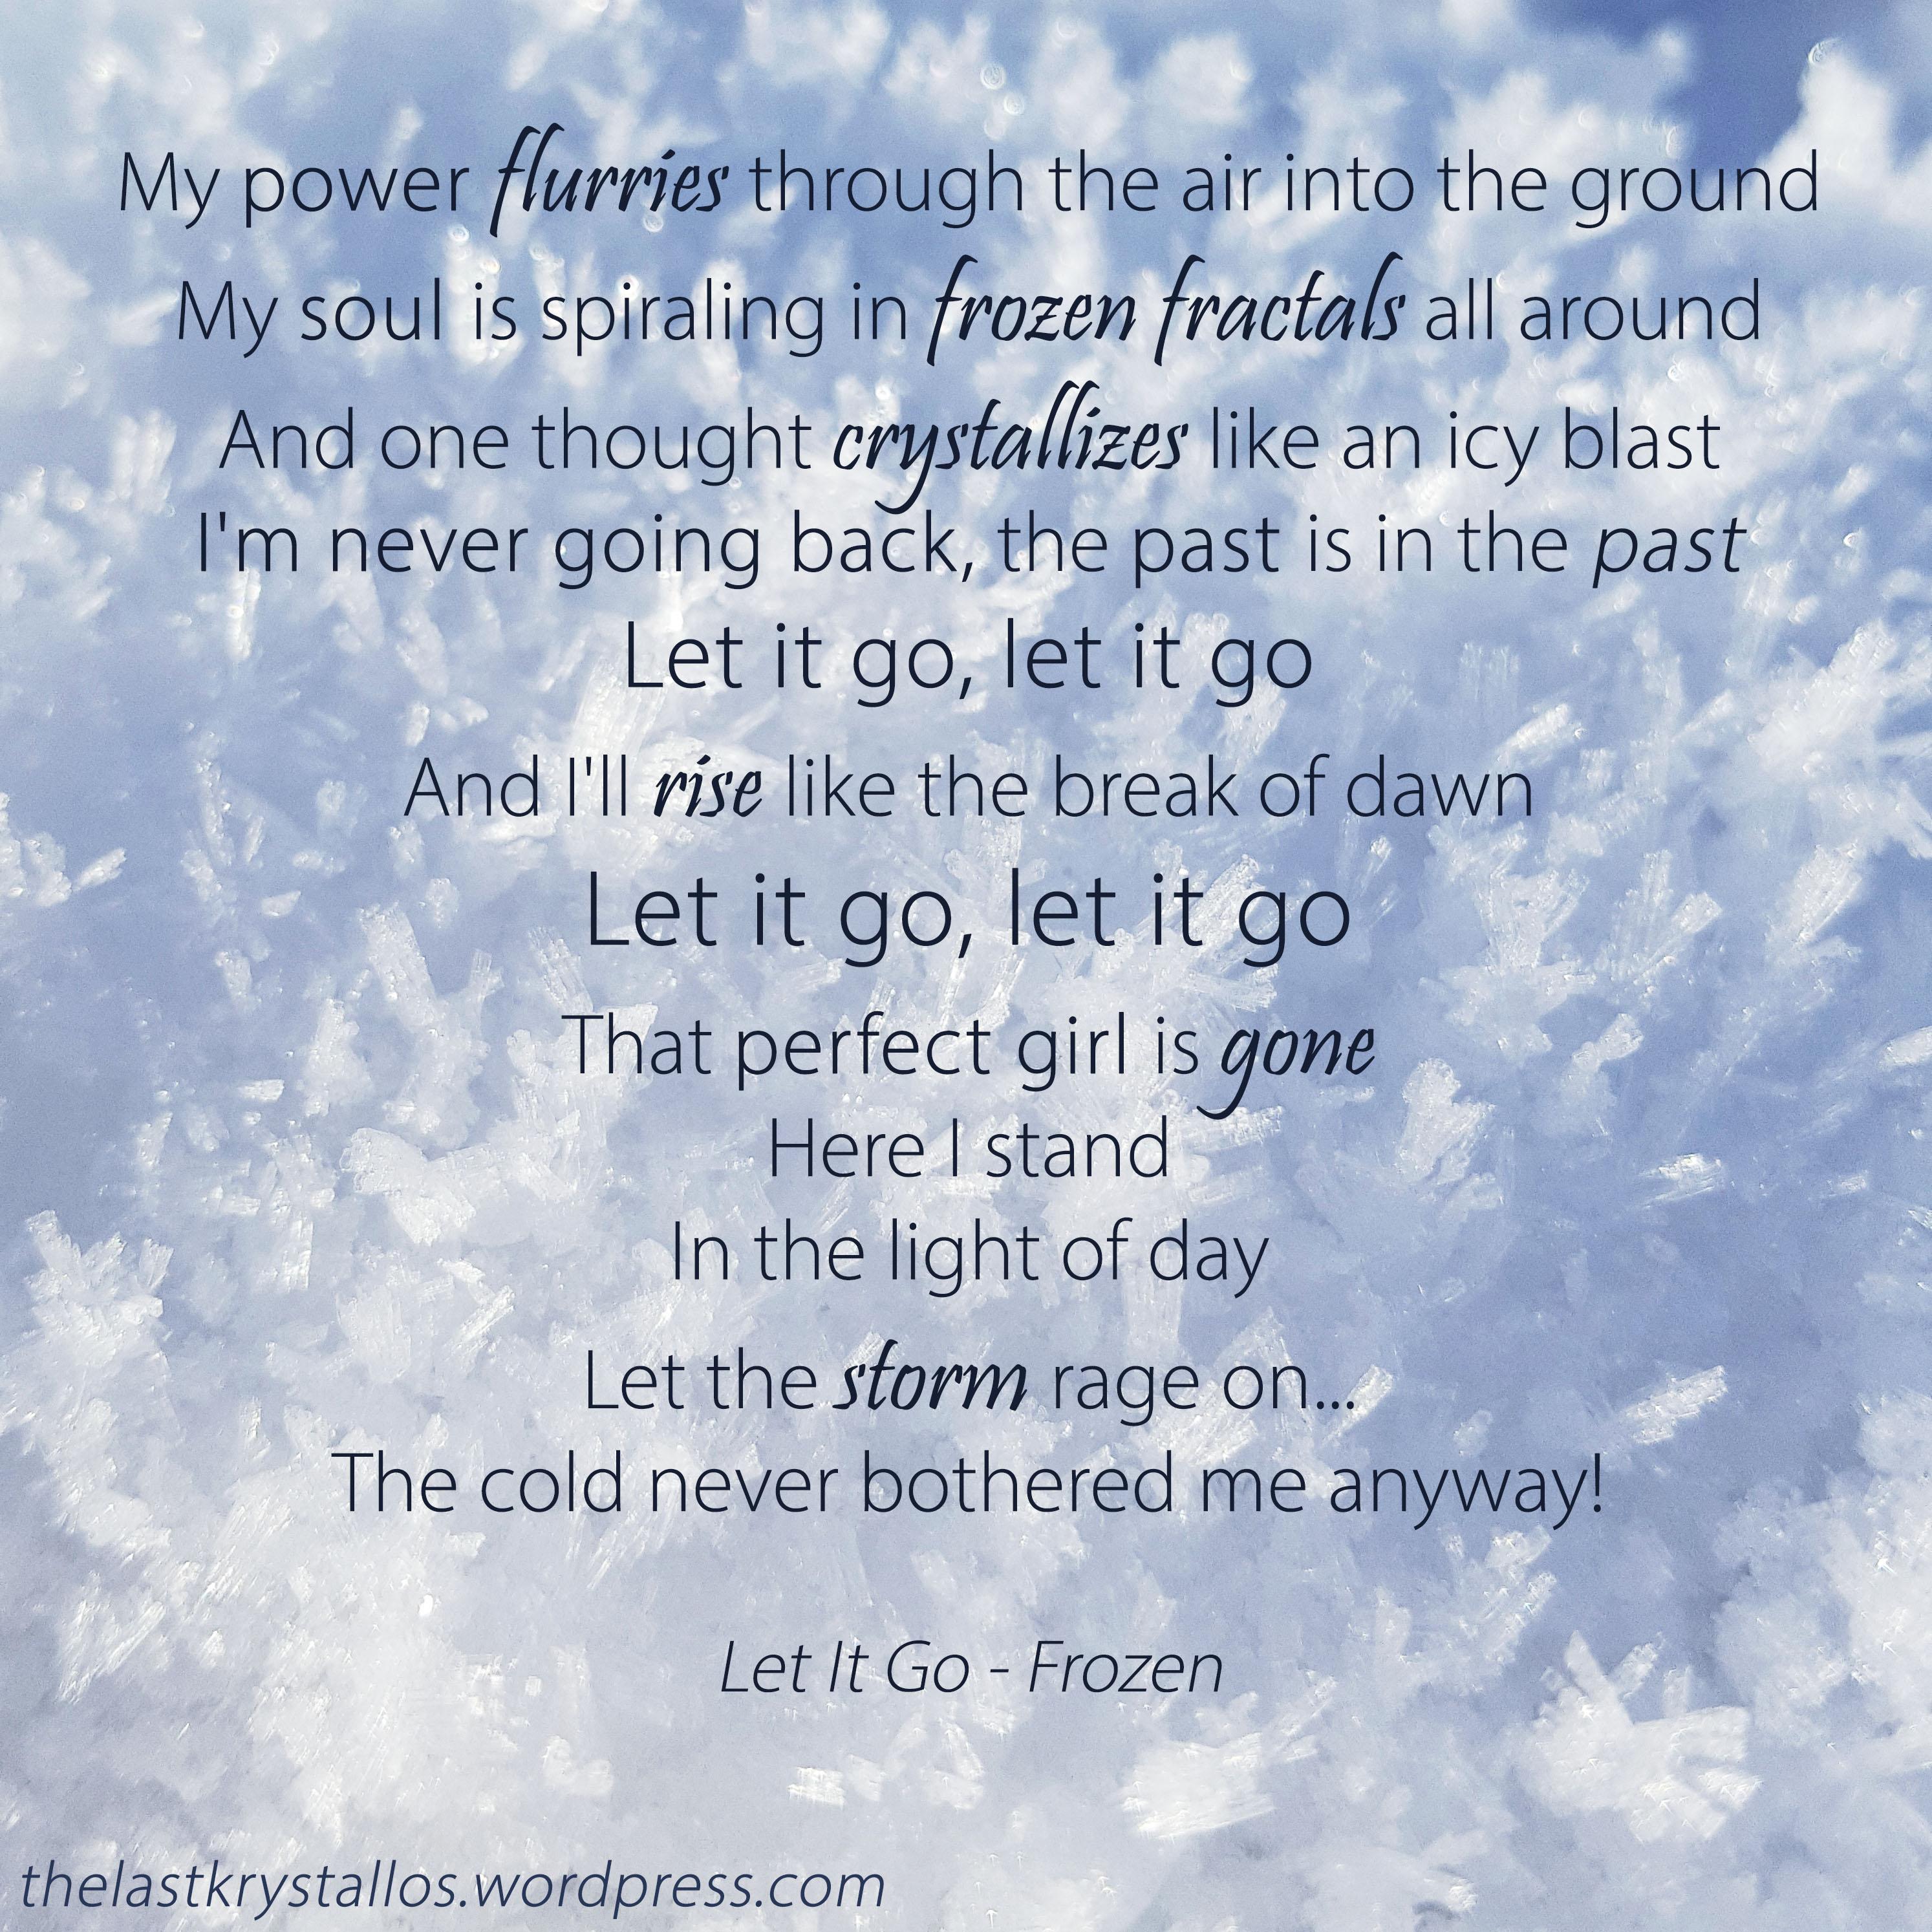 Frozen The Last Krystallos